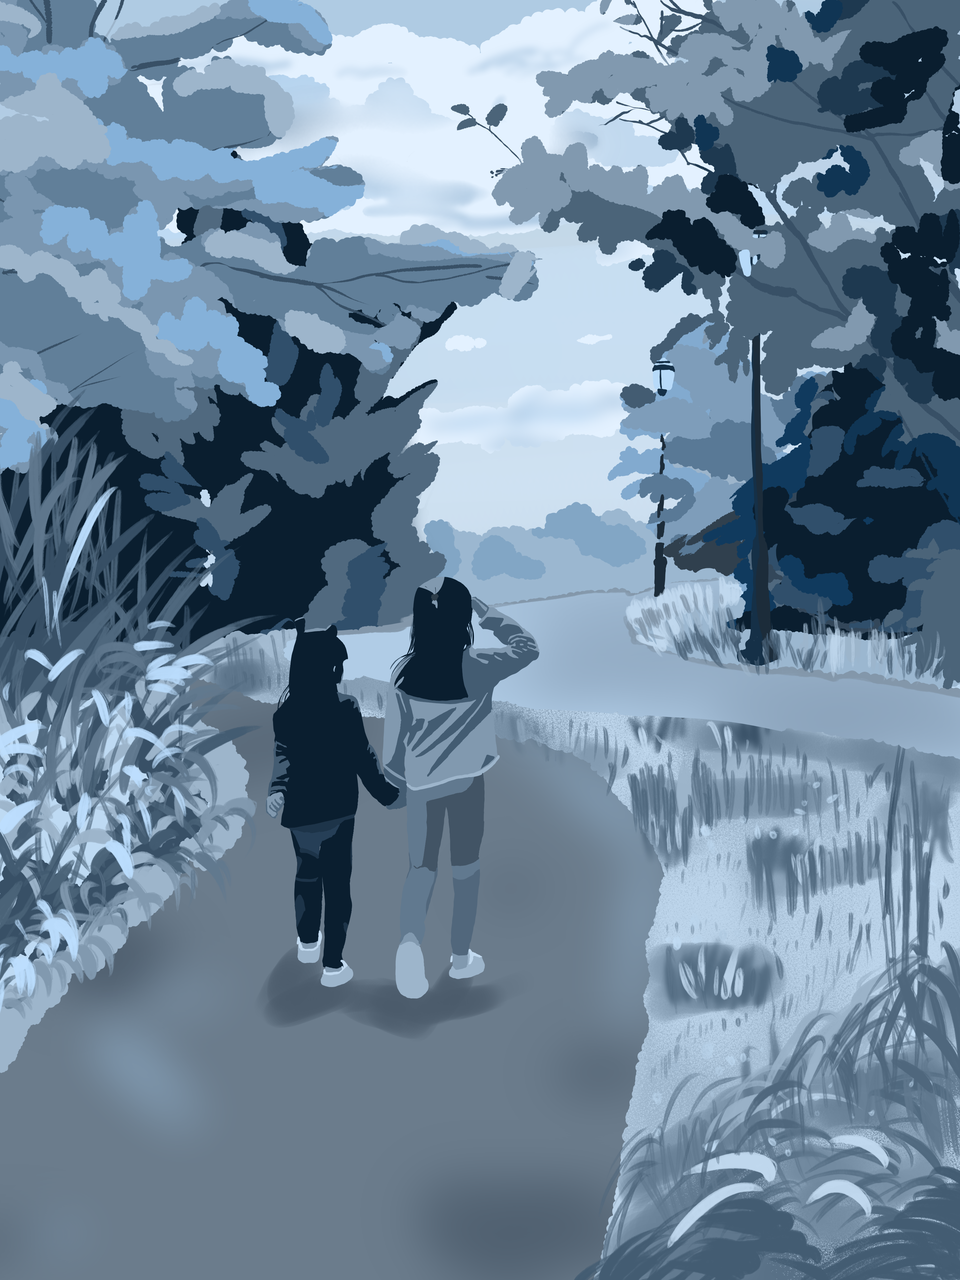 Monochrome - sisters Illust of Miss_Little_Orange_ May2021_Monochrome doodle blue monochrome illustration